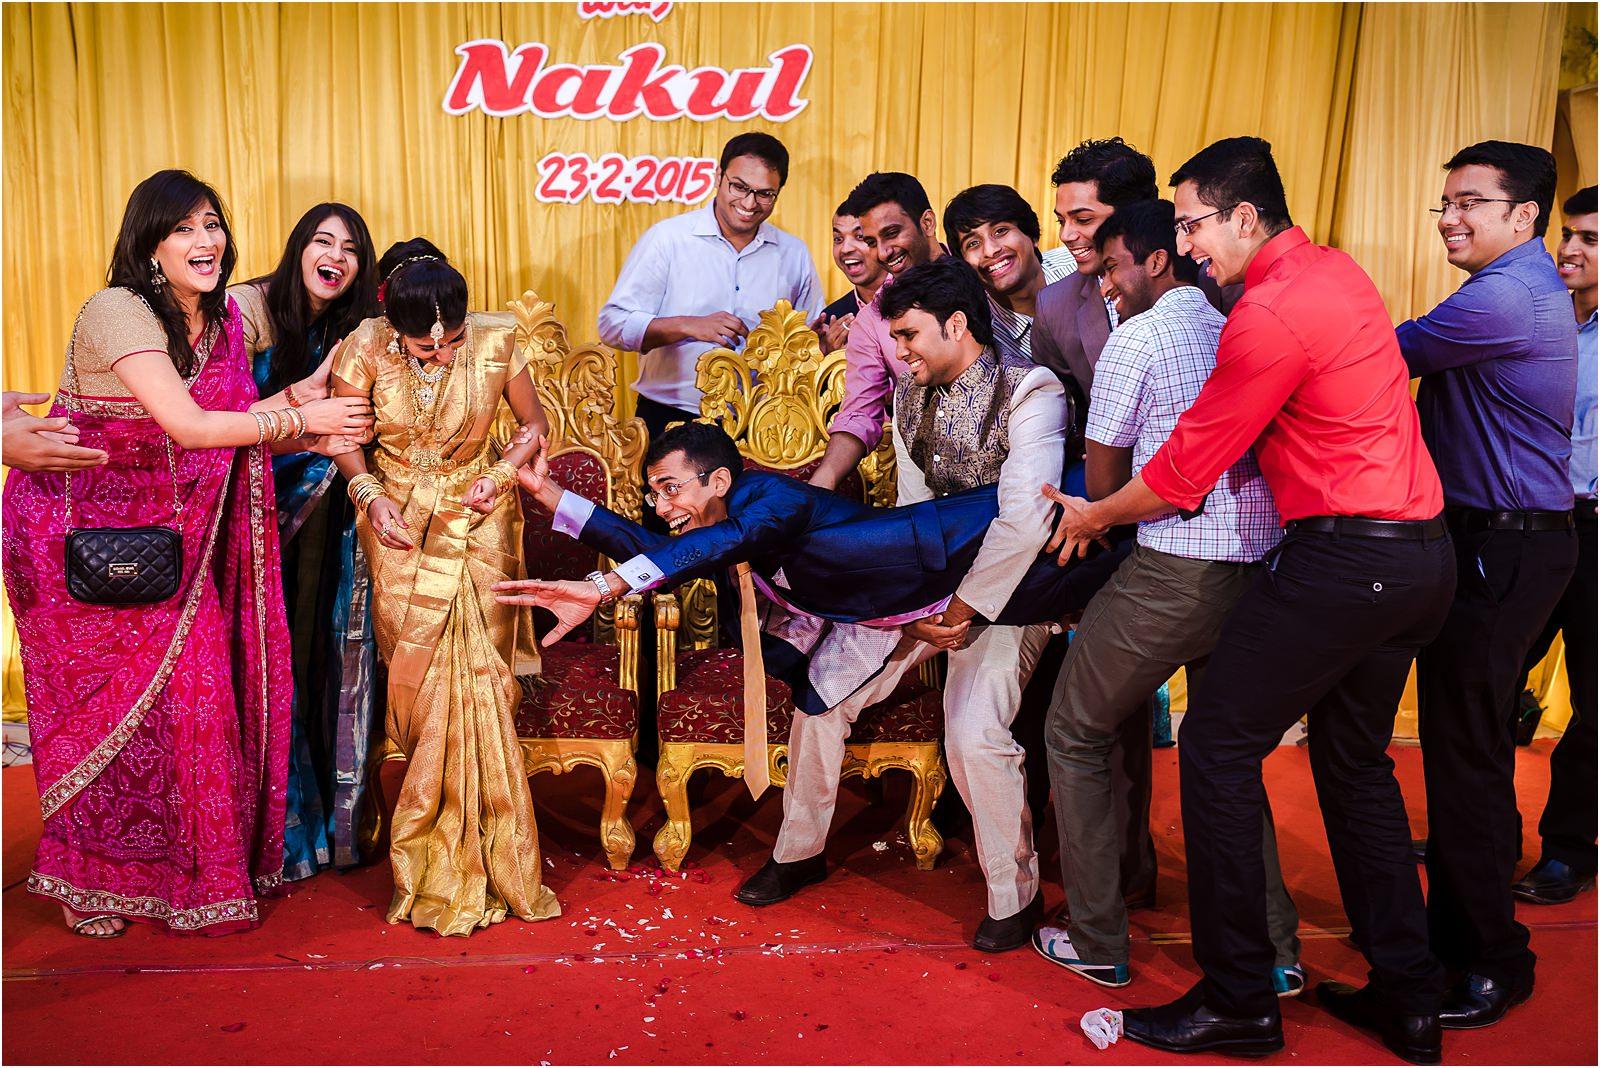 20150222-Nakul-Sindoori-Reception-571.jpg